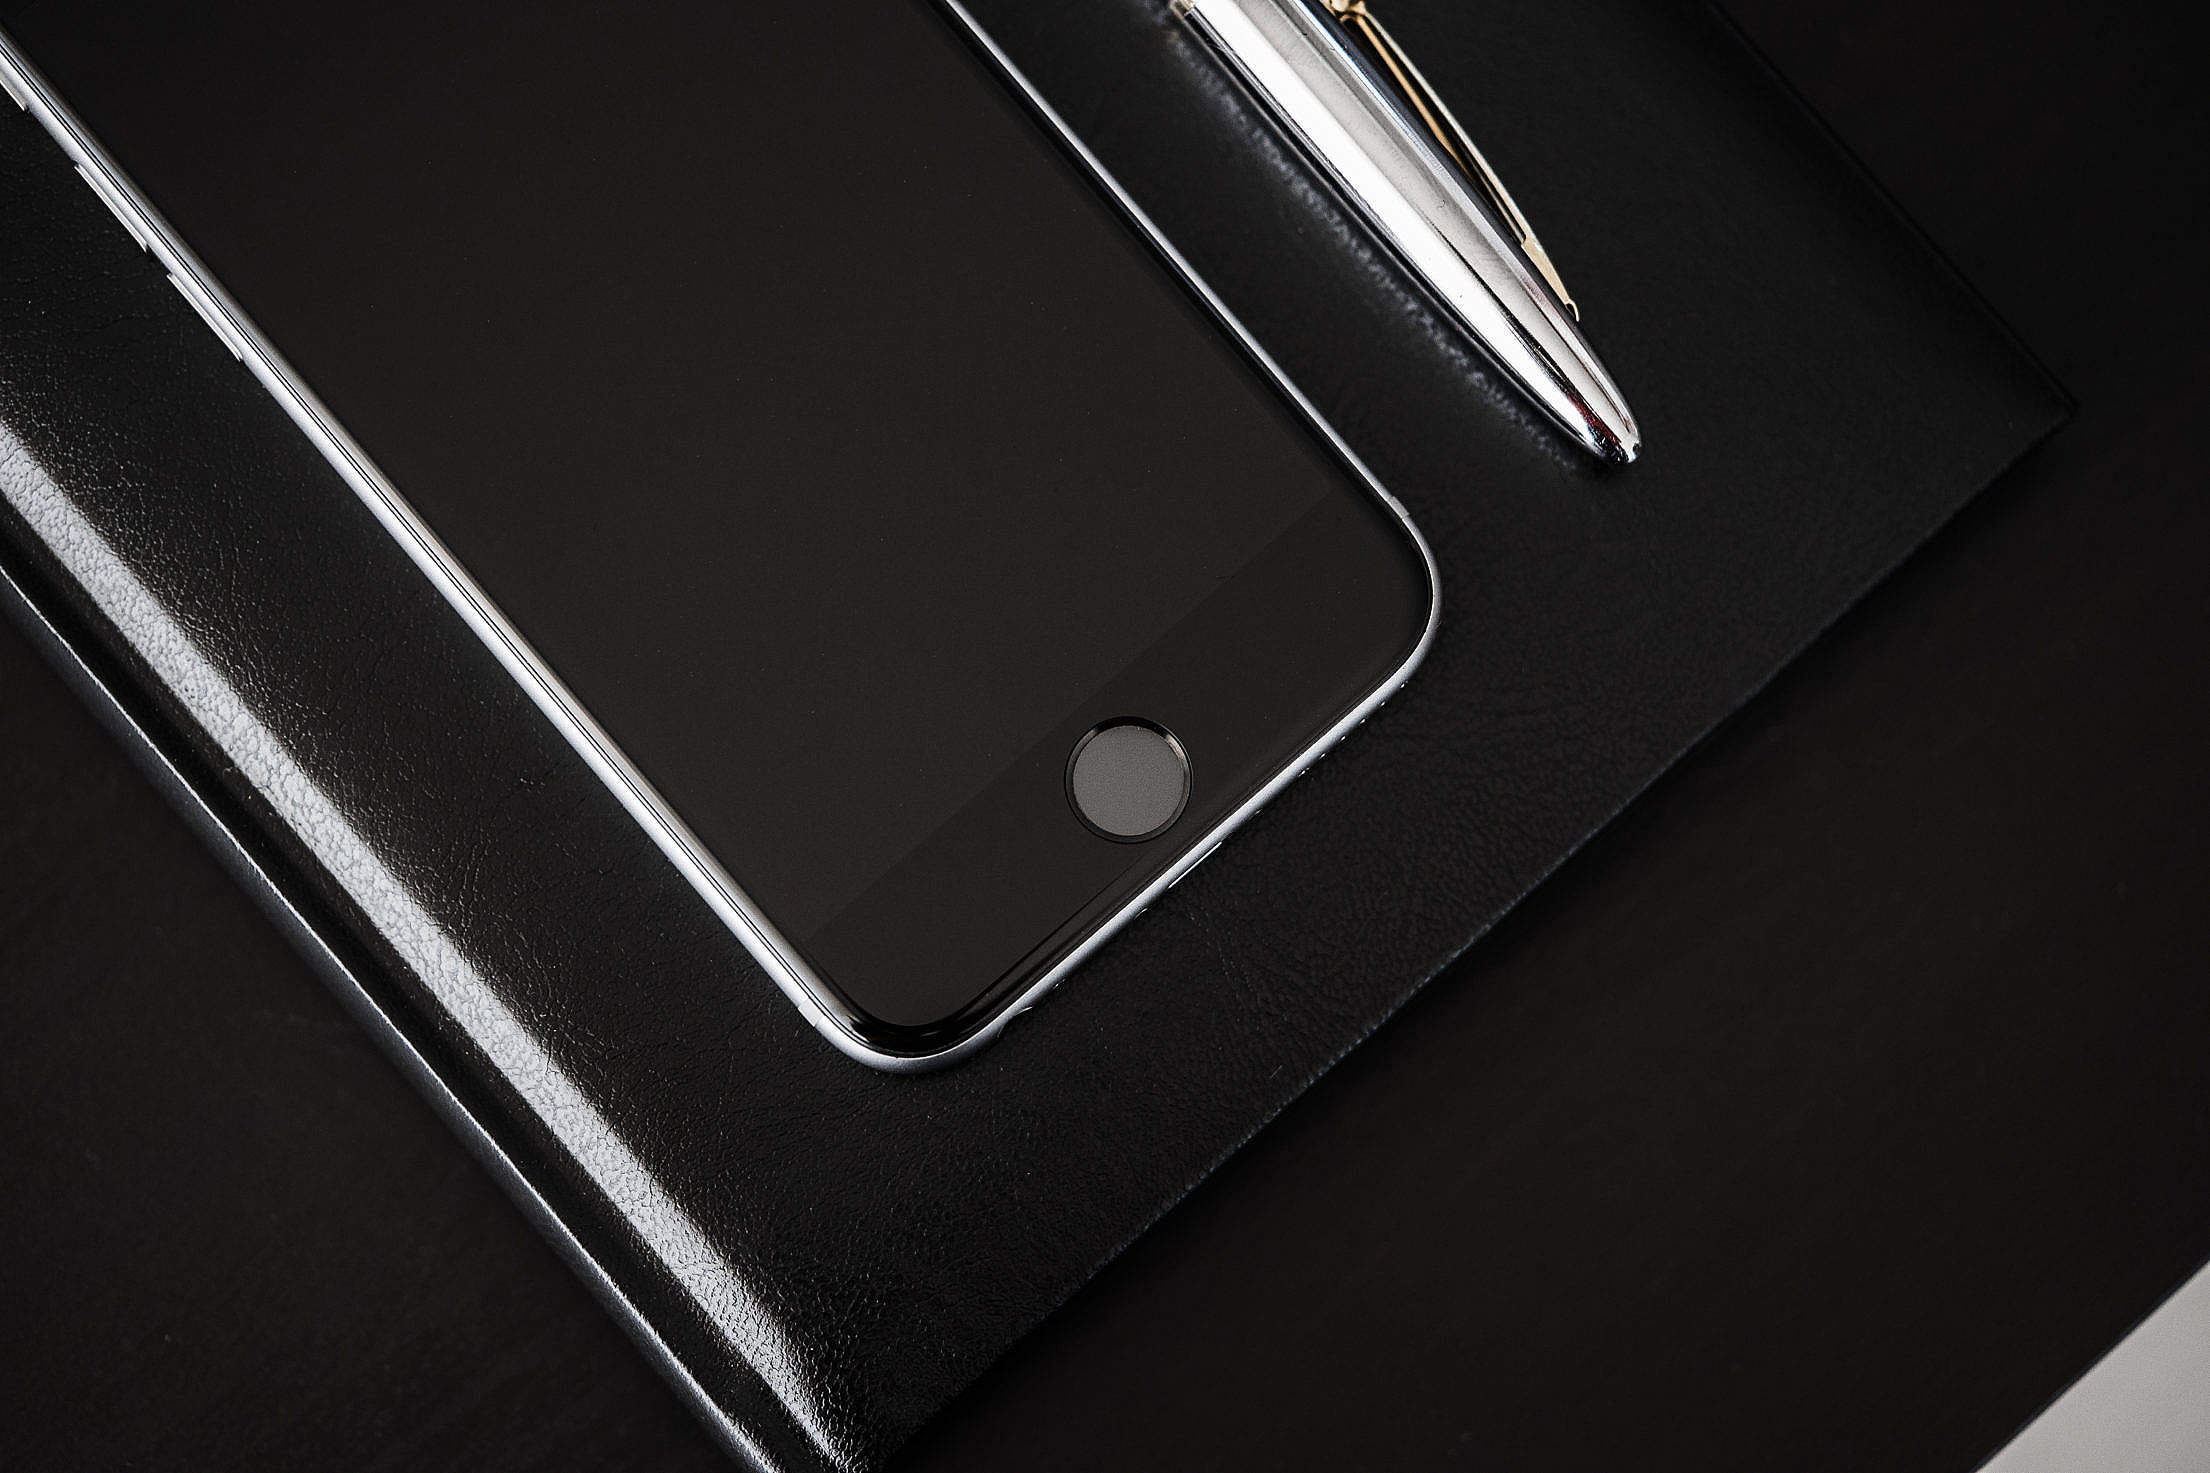 Black Desk, Black Diary, Black Smartphone Free Stock Photo